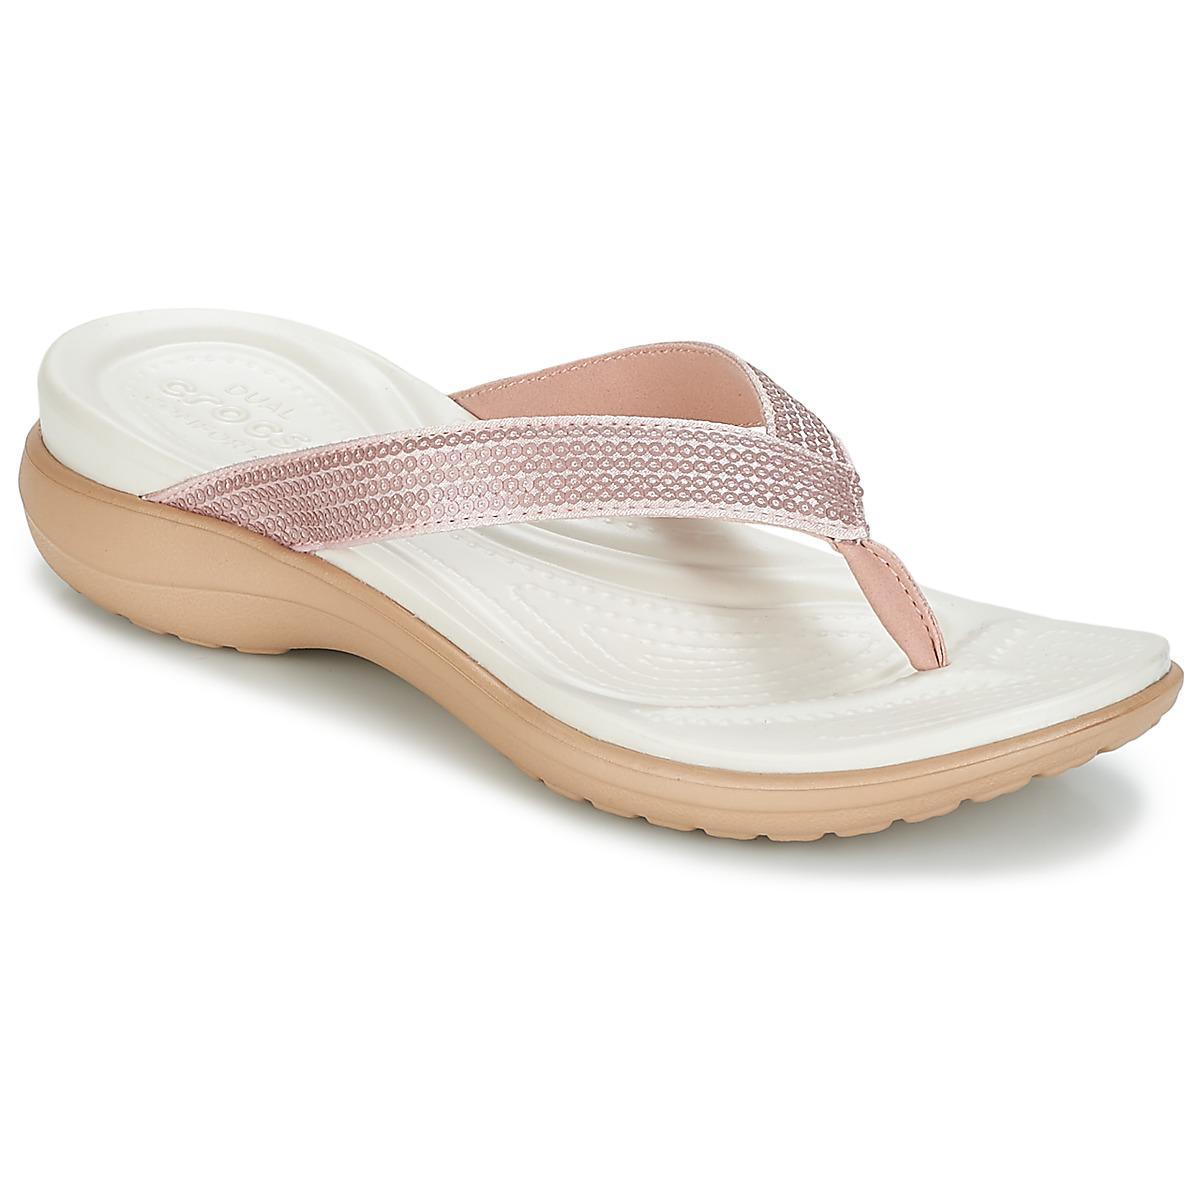 2d81cdb793e371 Crocs™ Capri V Sequin W Women s Sandals In Multicolour - Lyst